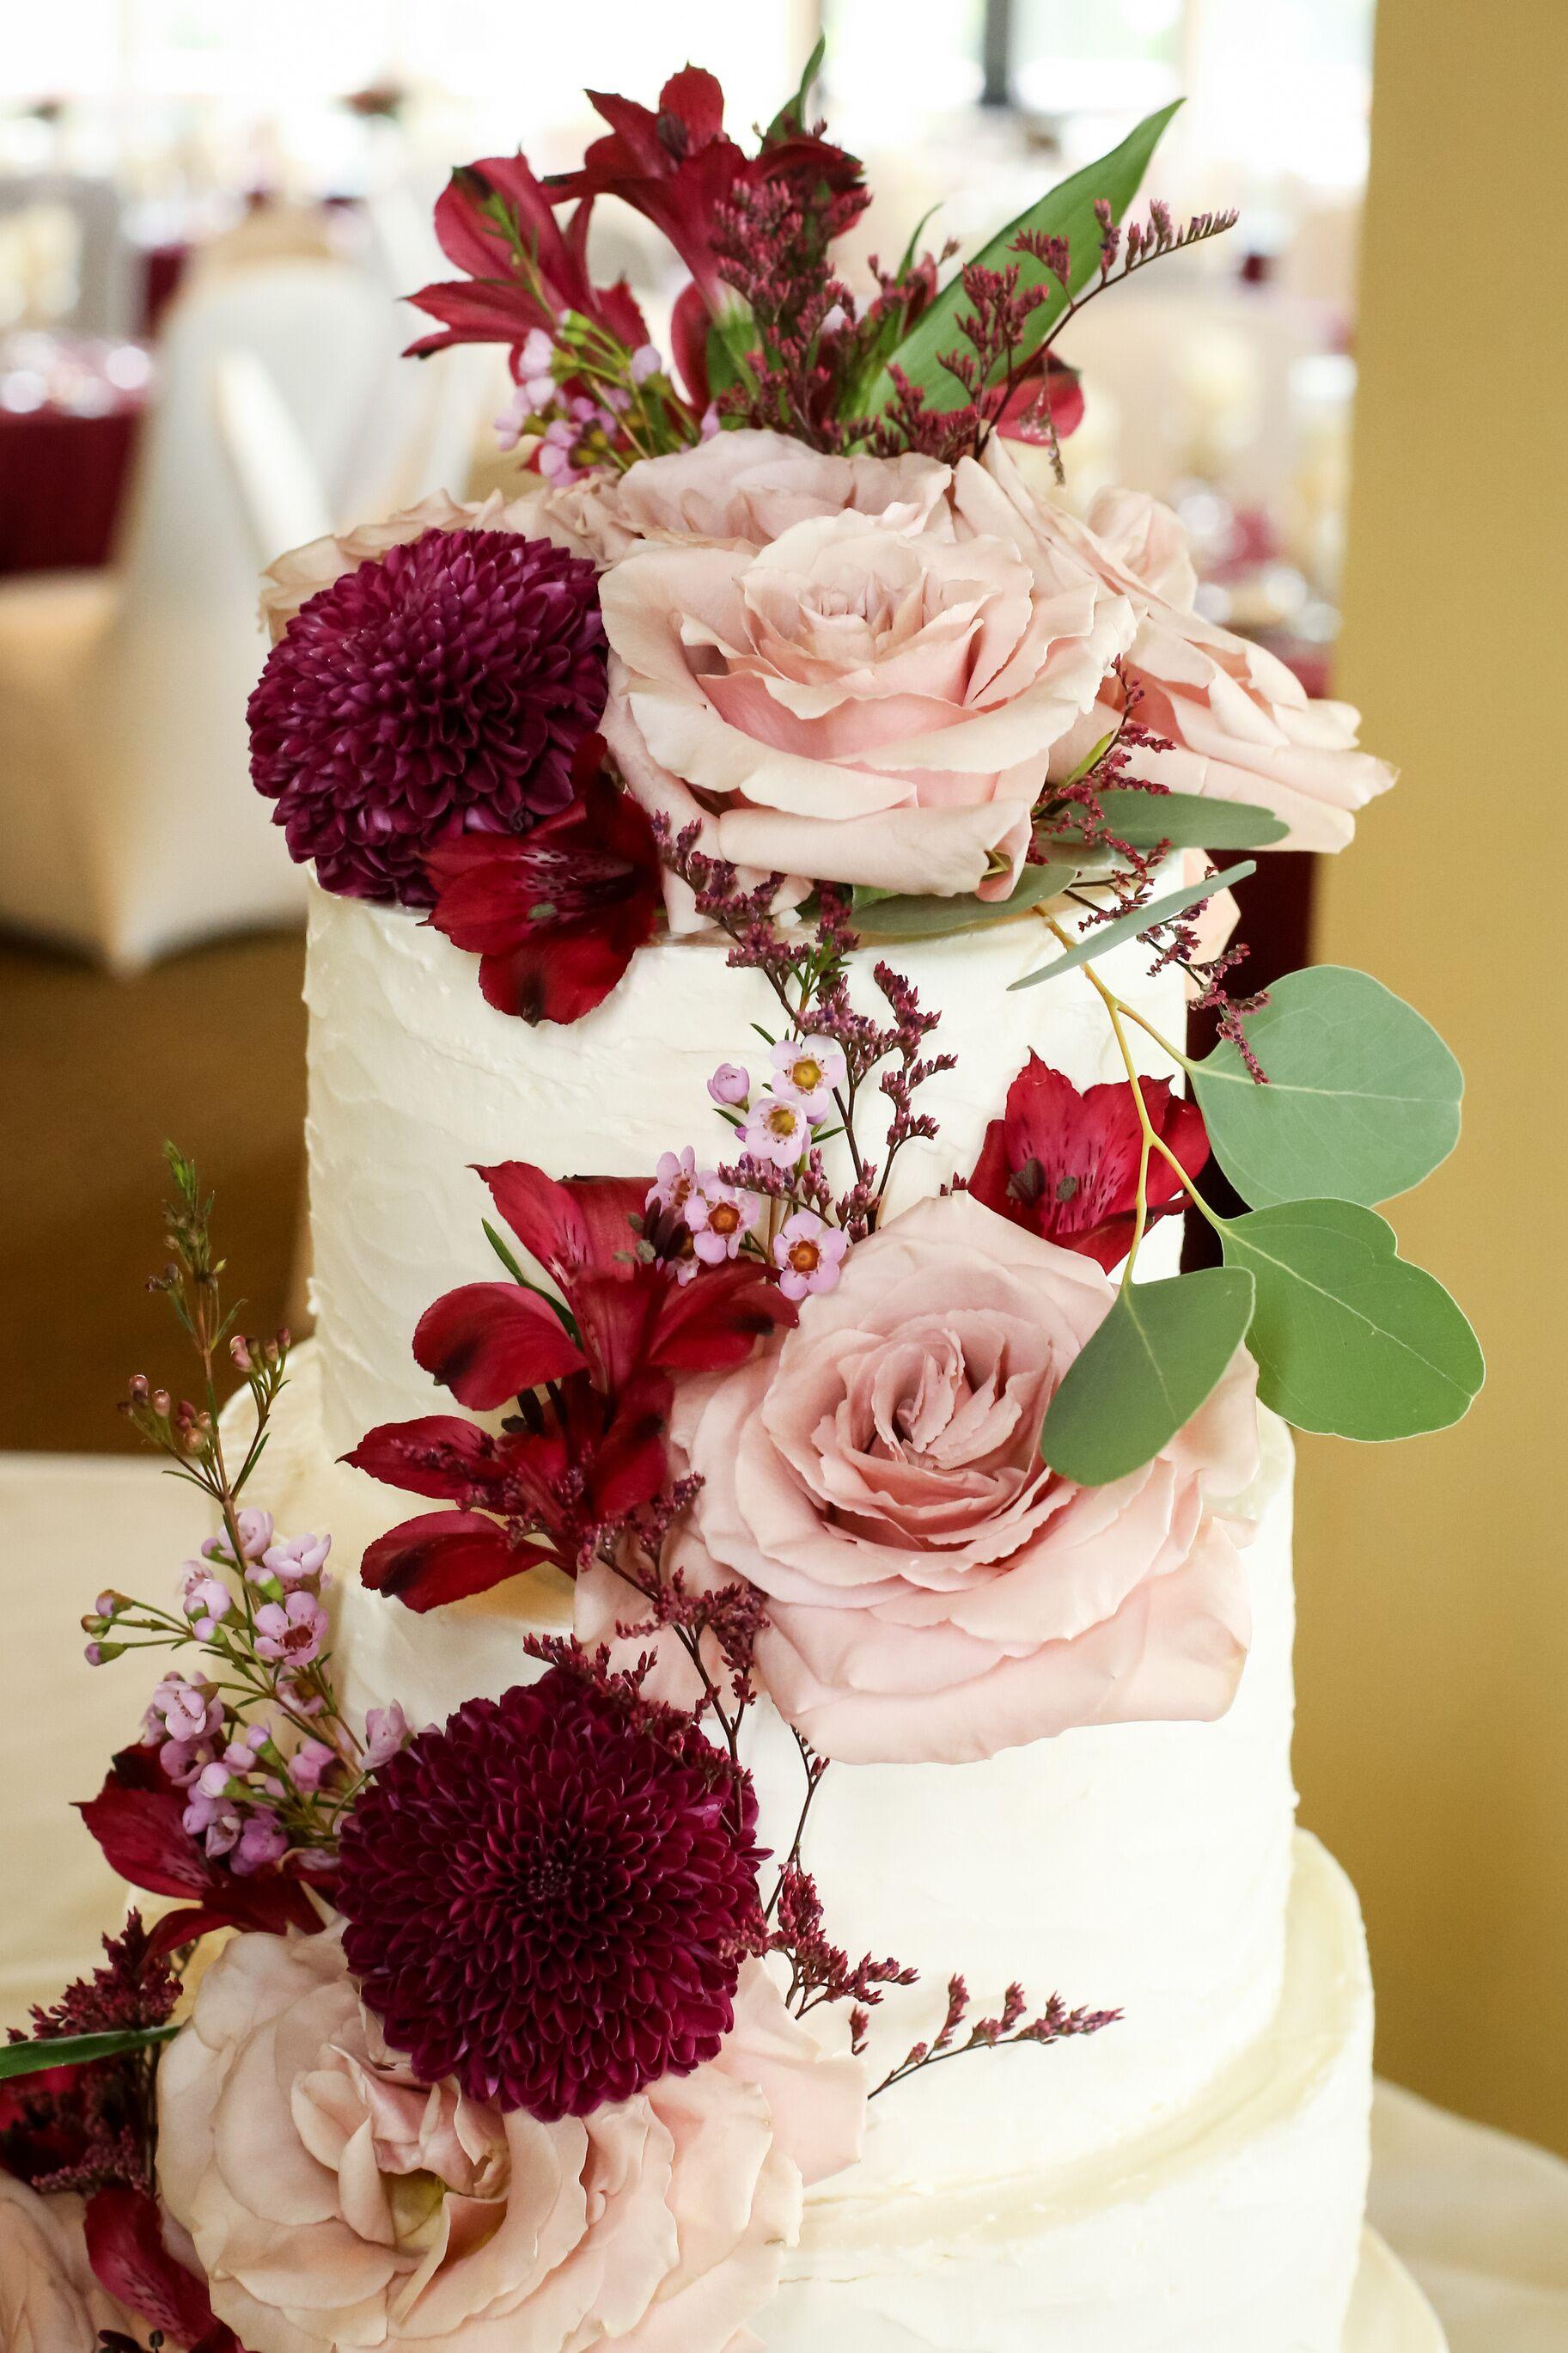 Wedding Venues in Albuquerque, NM - The Knot